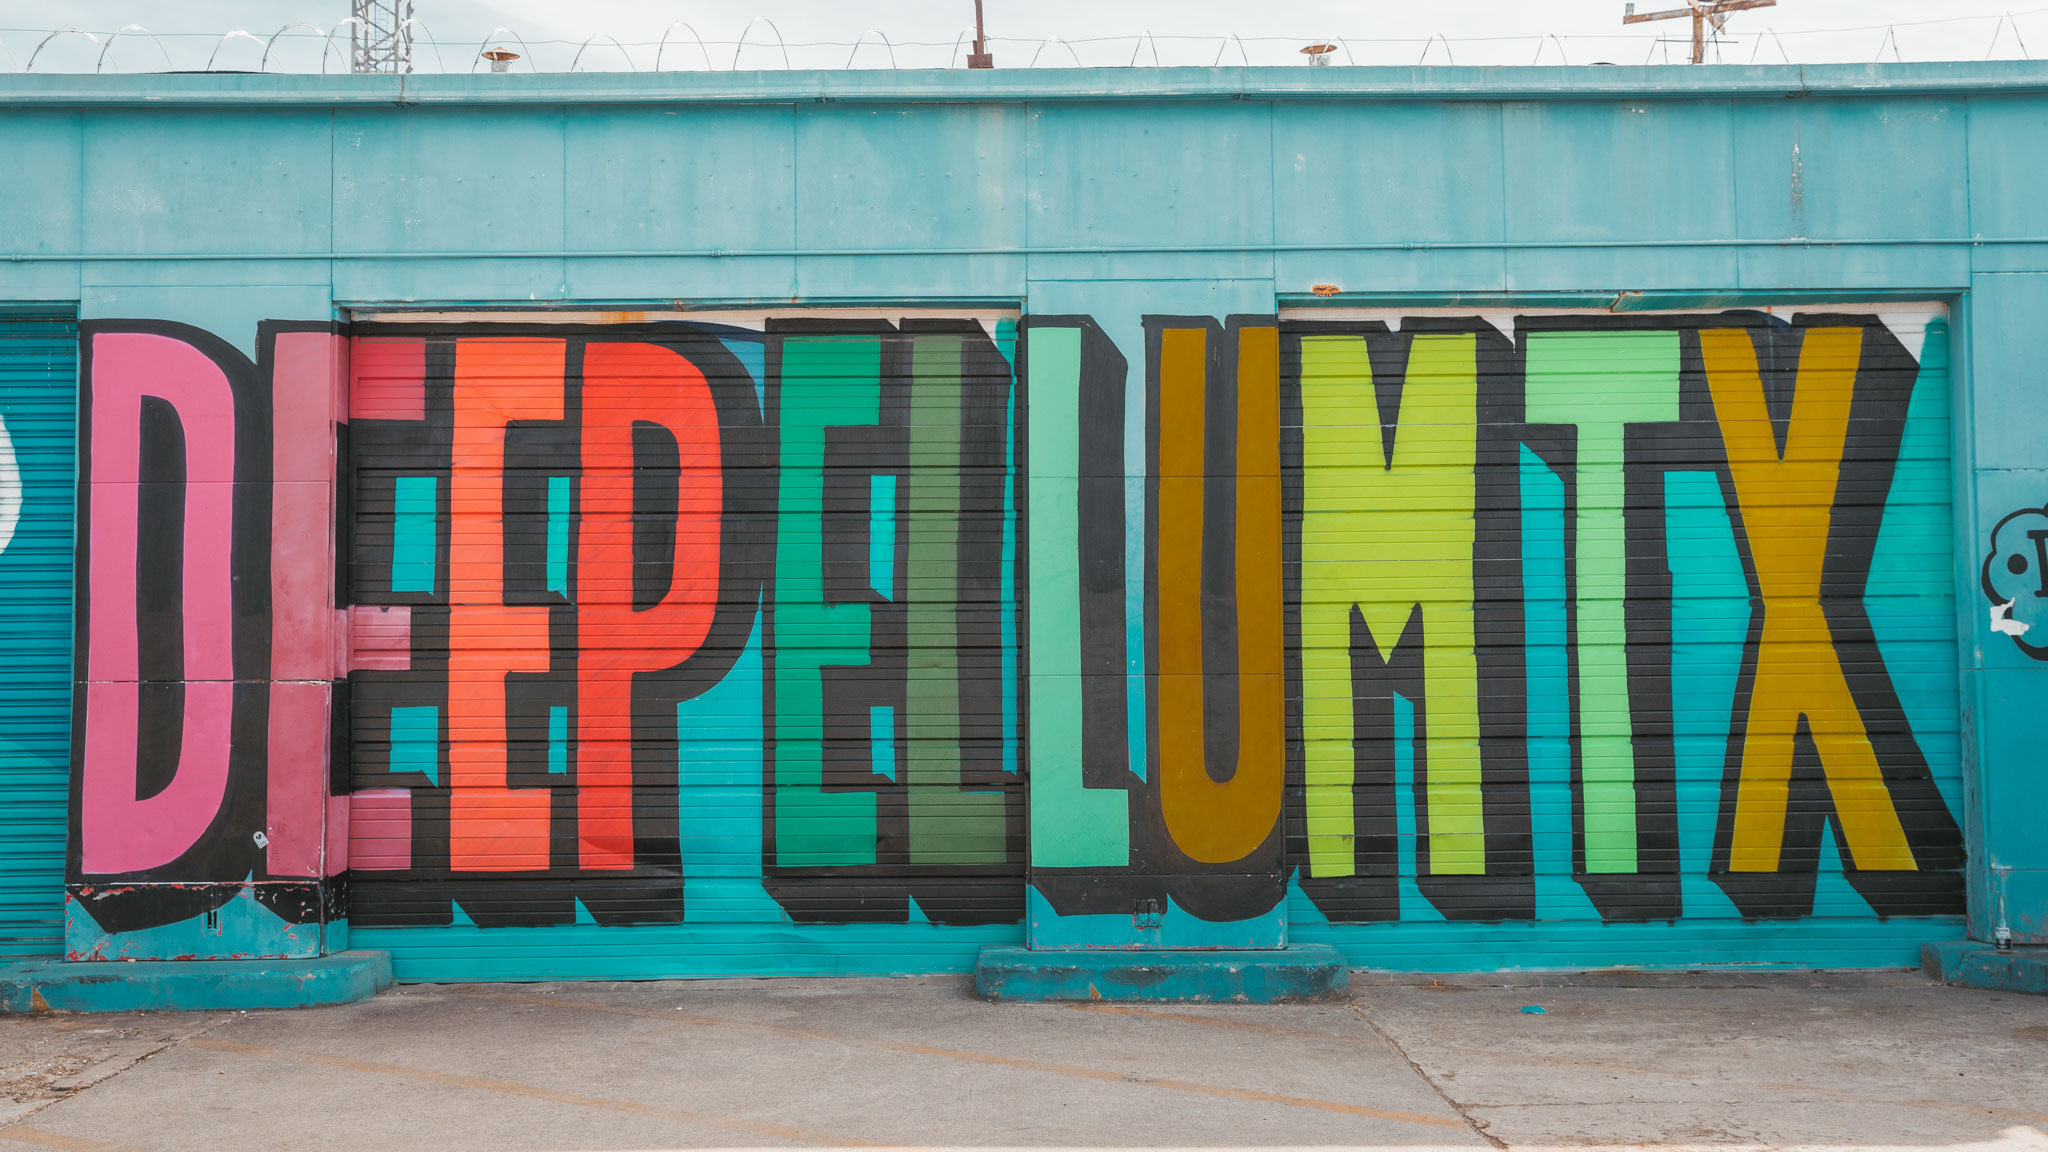 Colorful mural in Deep Ellum in Dallas, Texas